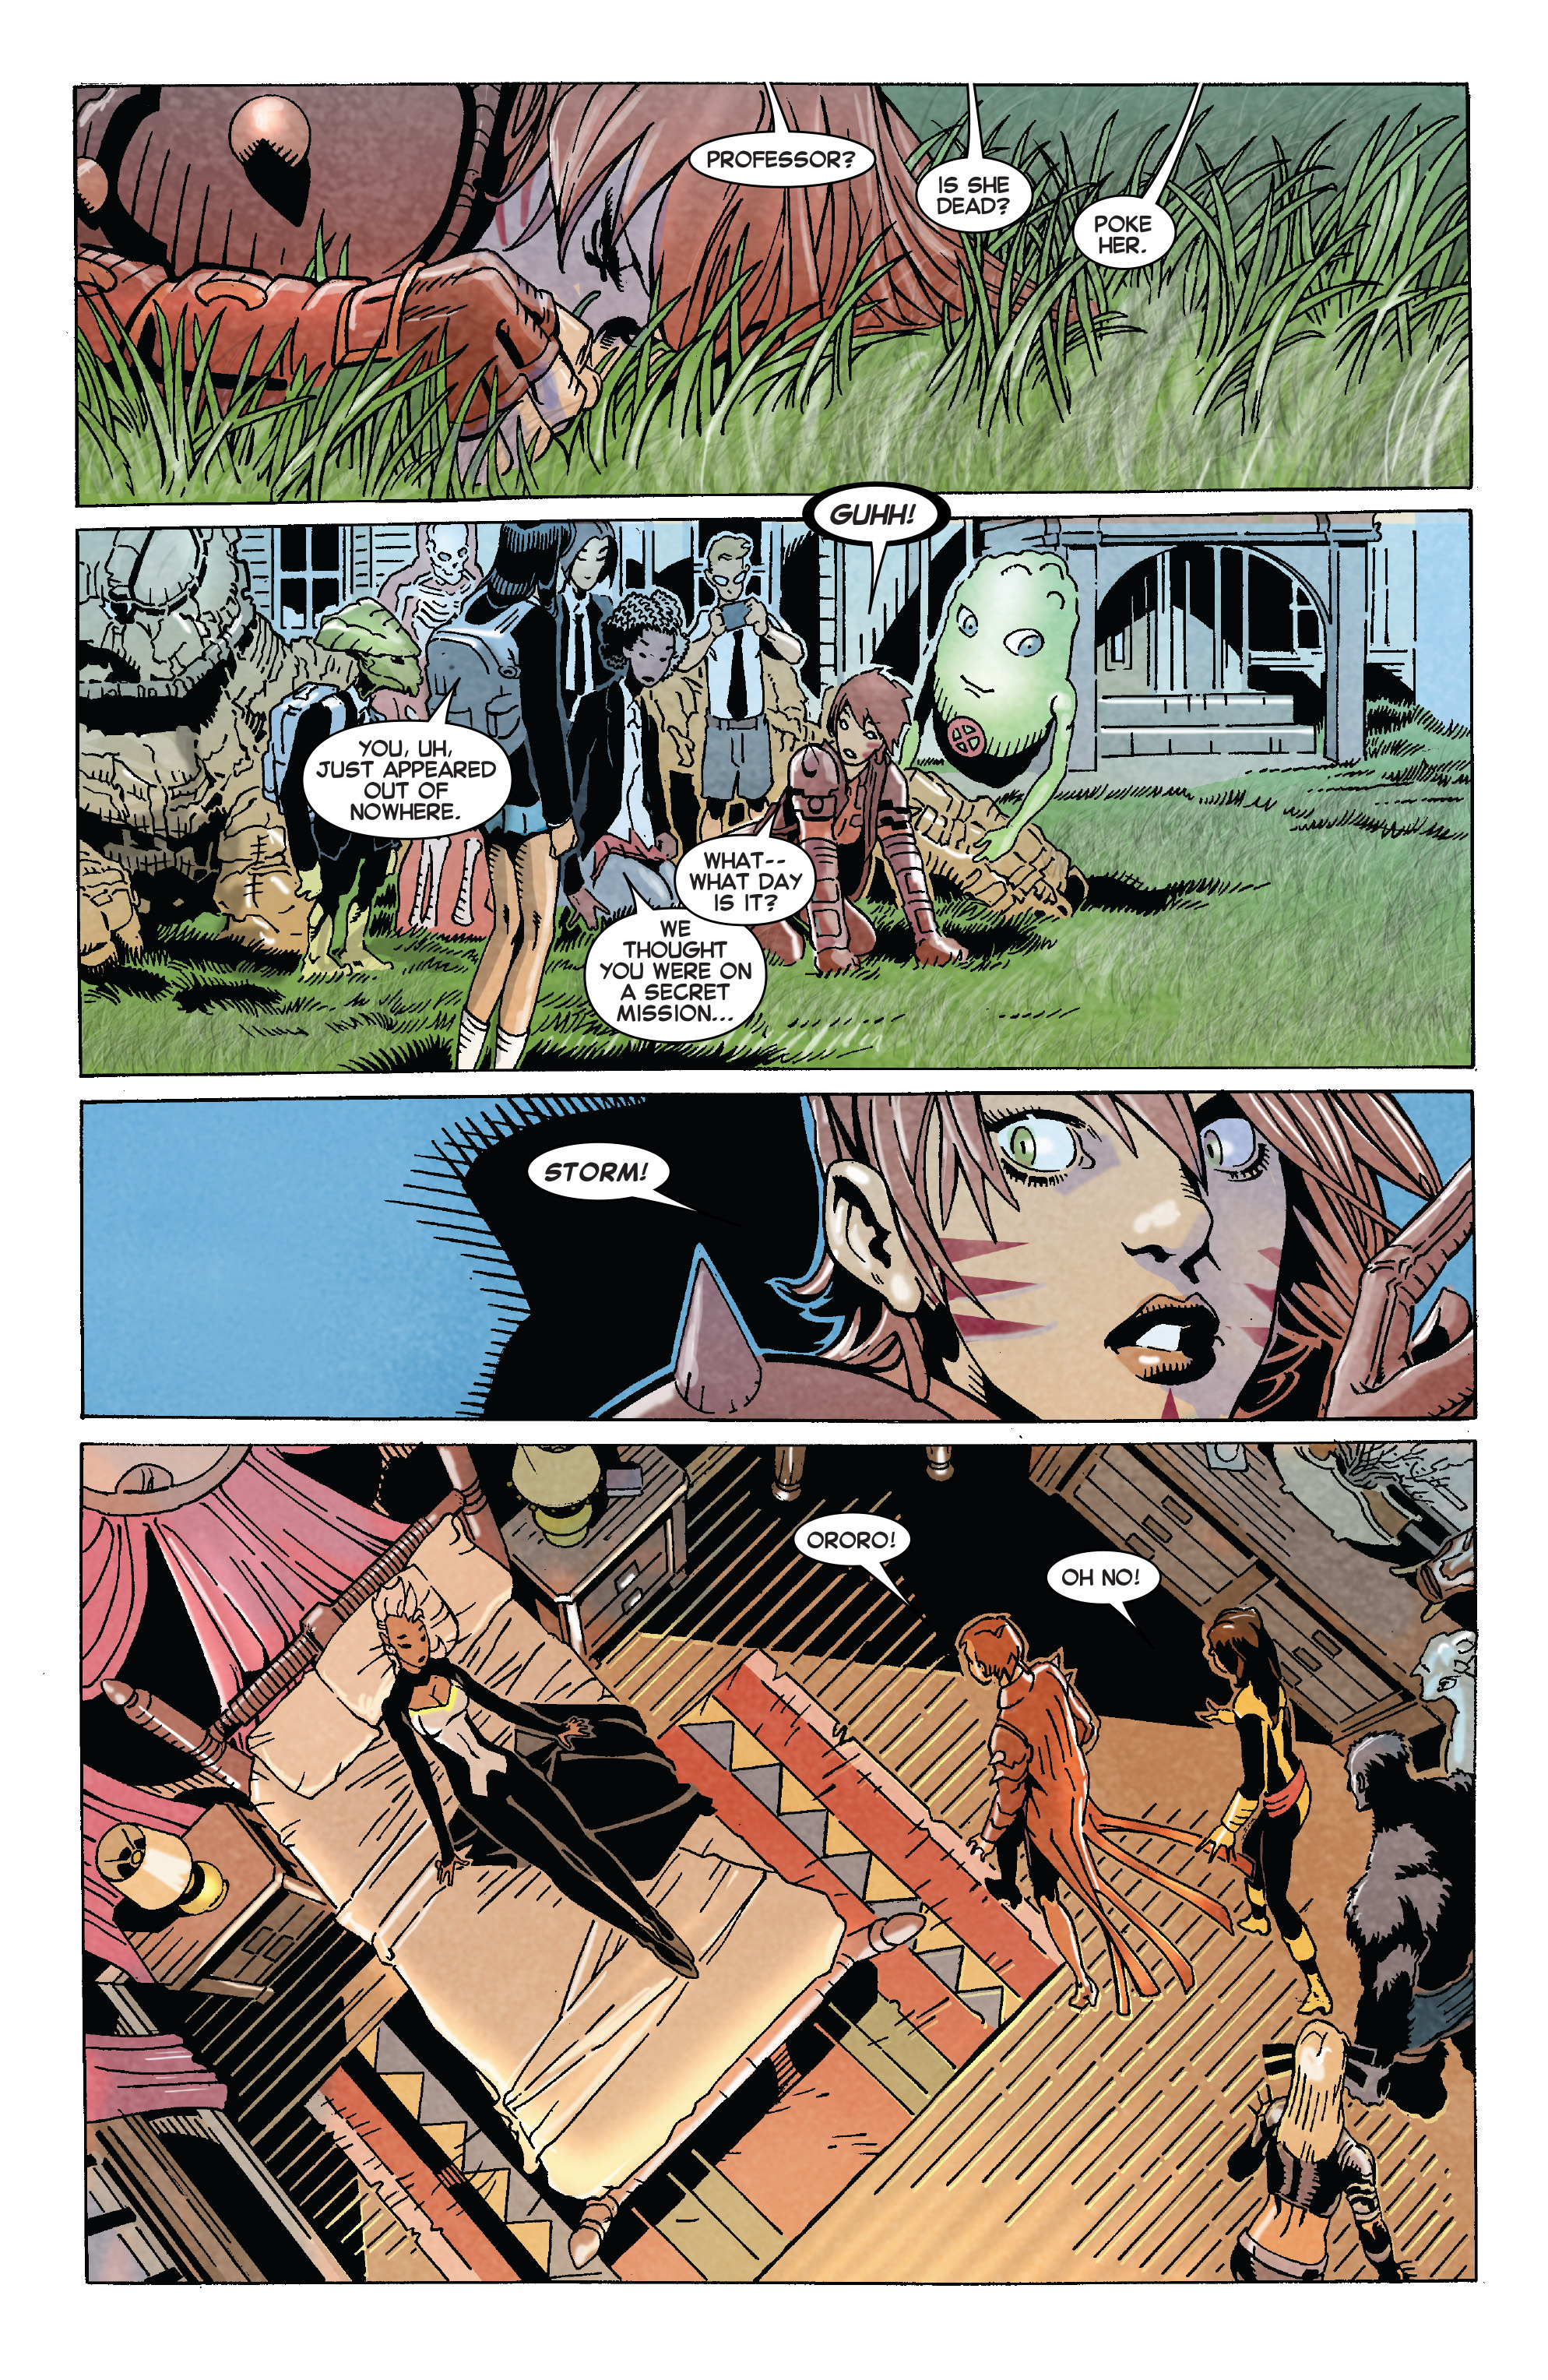 Read online Uncanny X-Men (2013) comic -  Issue # _TPB 5 - The Omega Mutant - 33